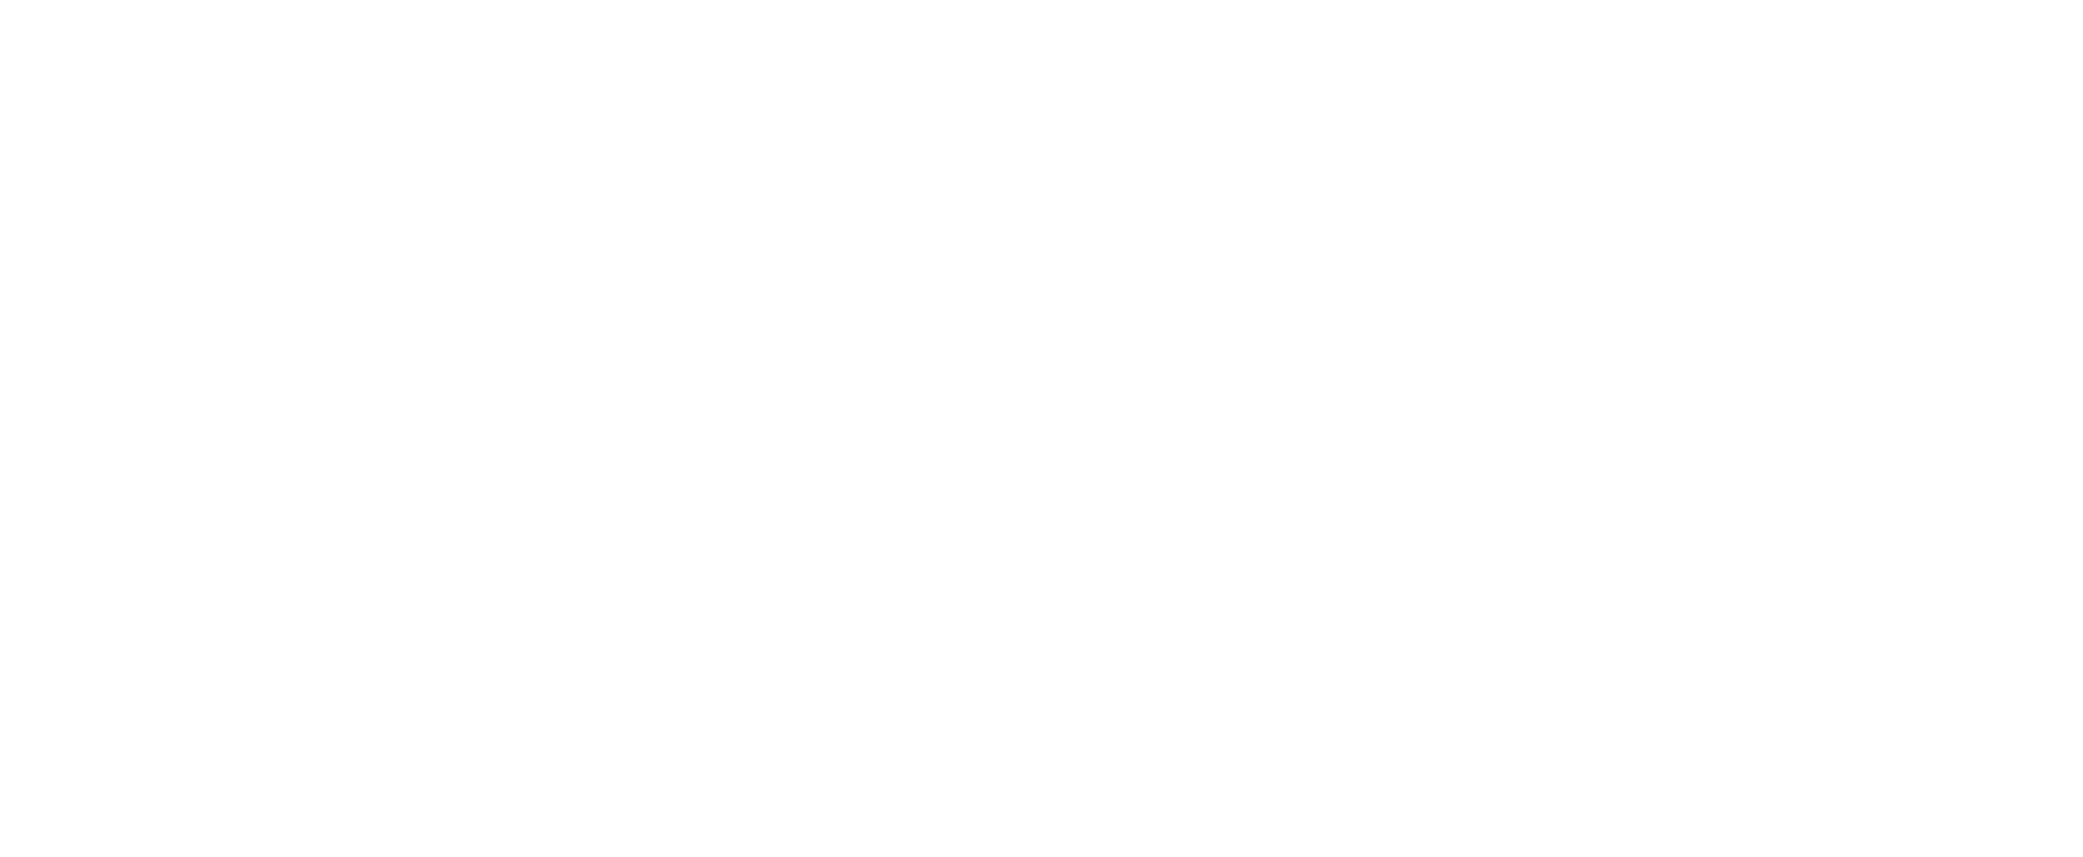 1199 North Fairfax x Community Three